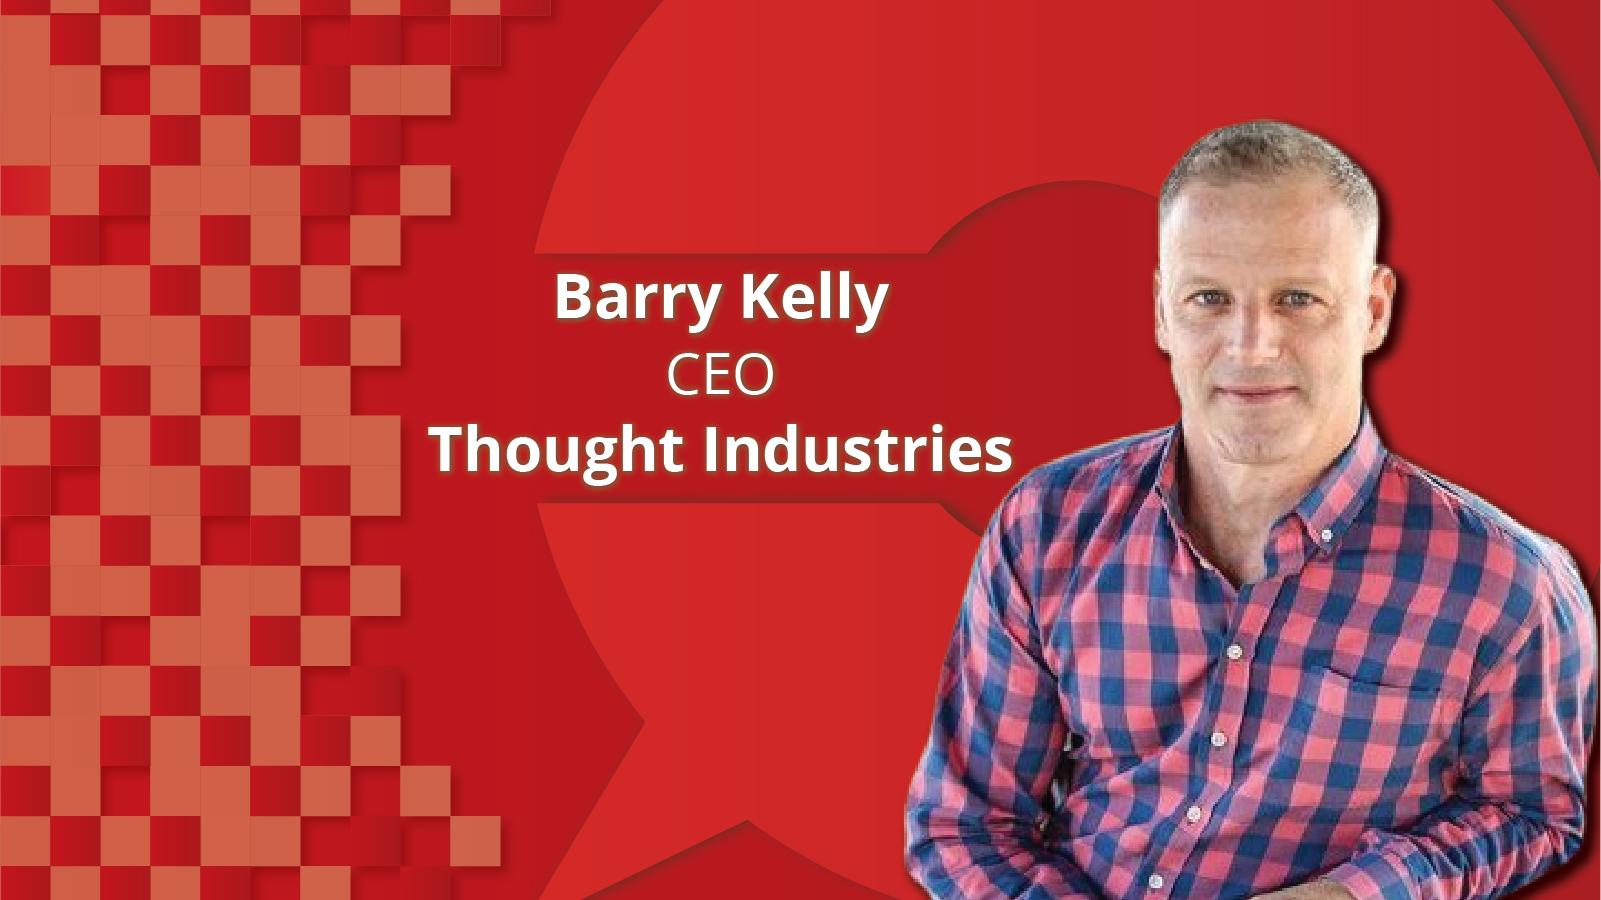 Barry Kelly